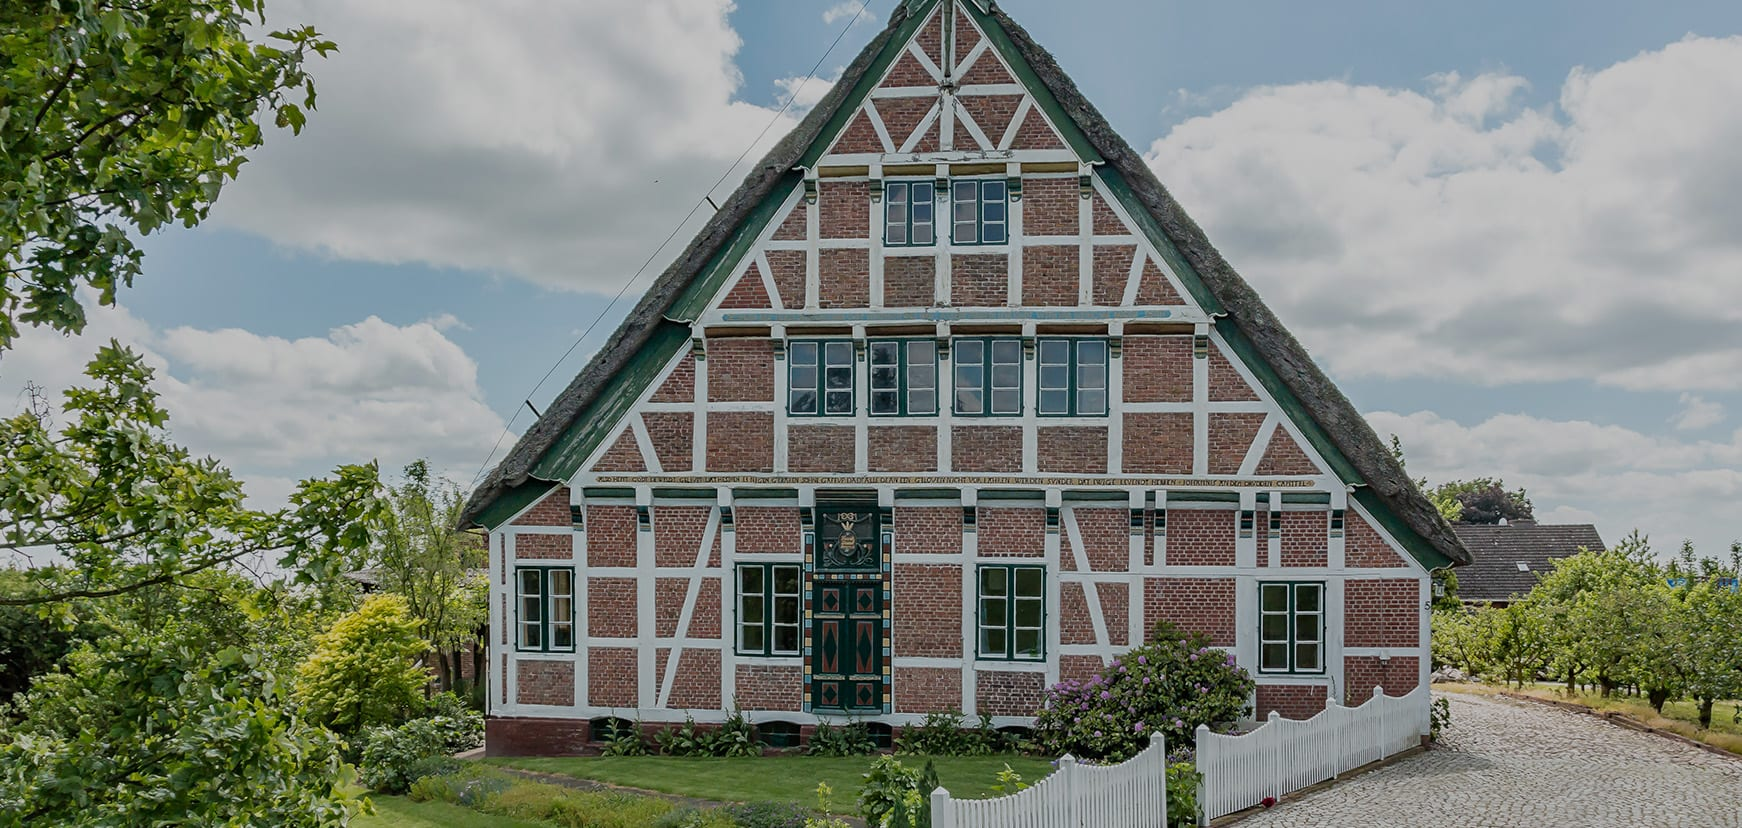 Fachwerkhaus Altes Land